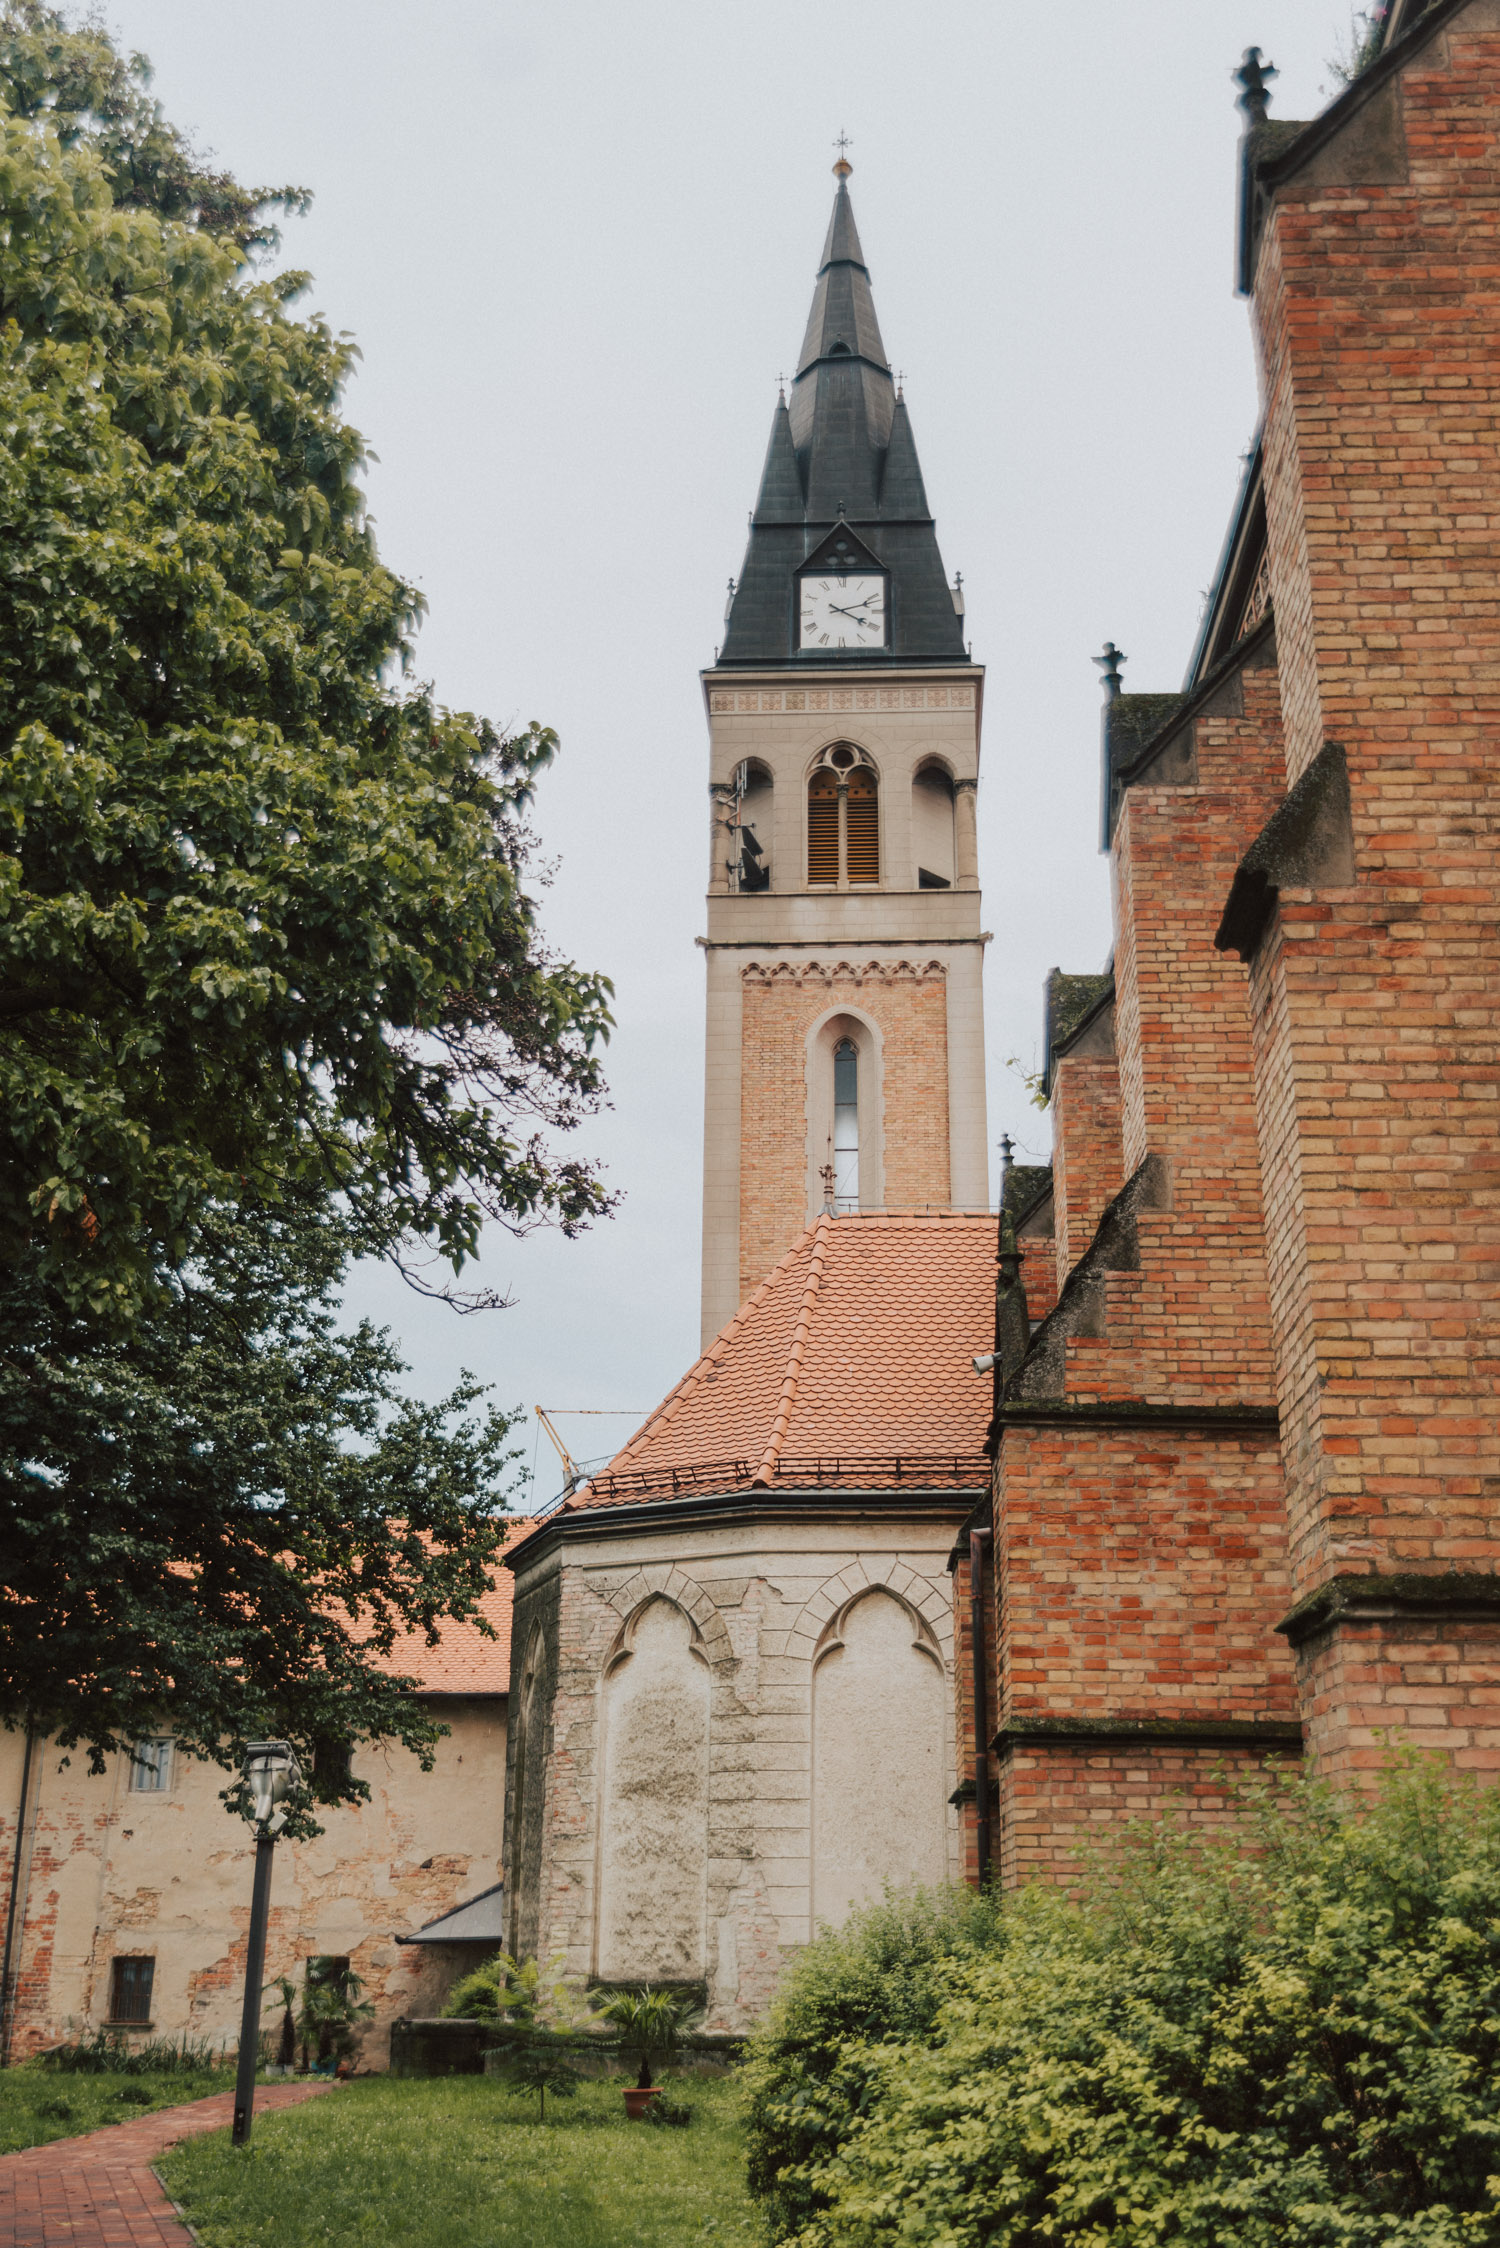 Church and Monastery of St. John of Capistrano in Ilok, Croatia